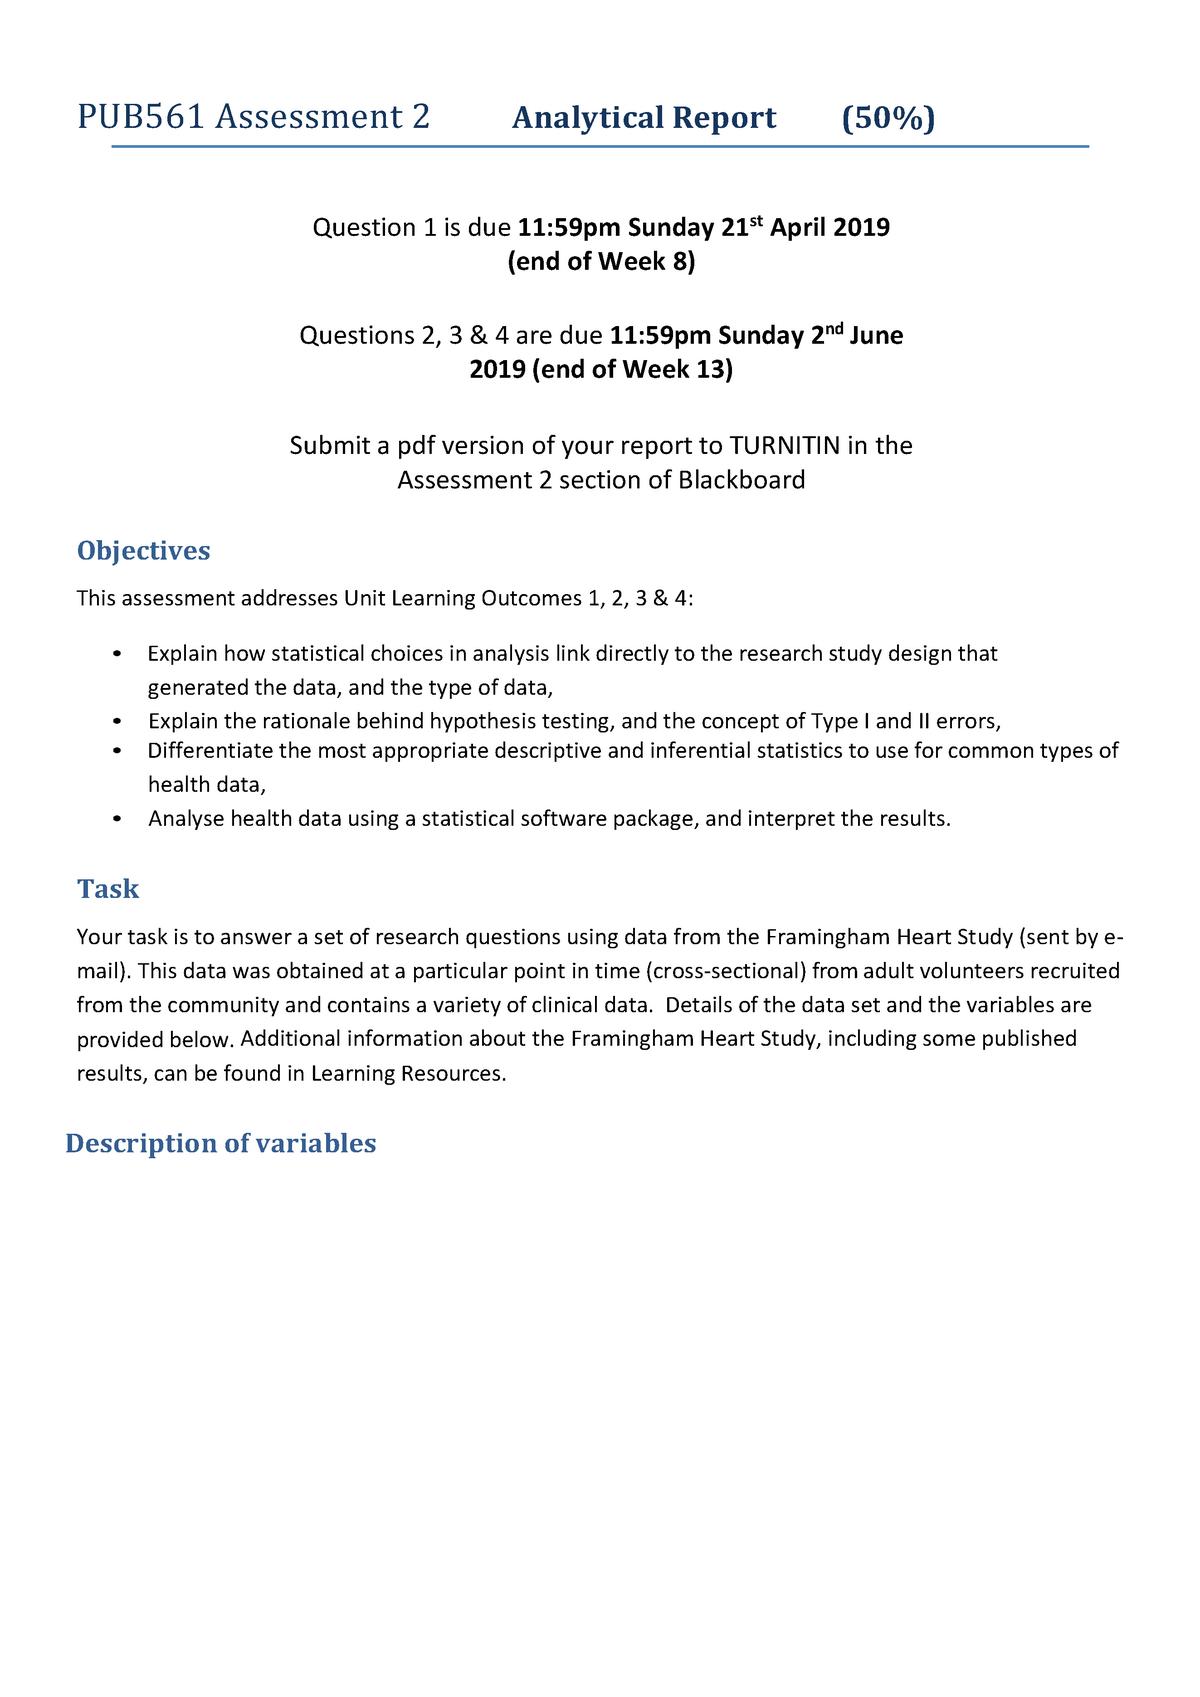 PUB561 Assignment Framingham - Statistical Methods in Health